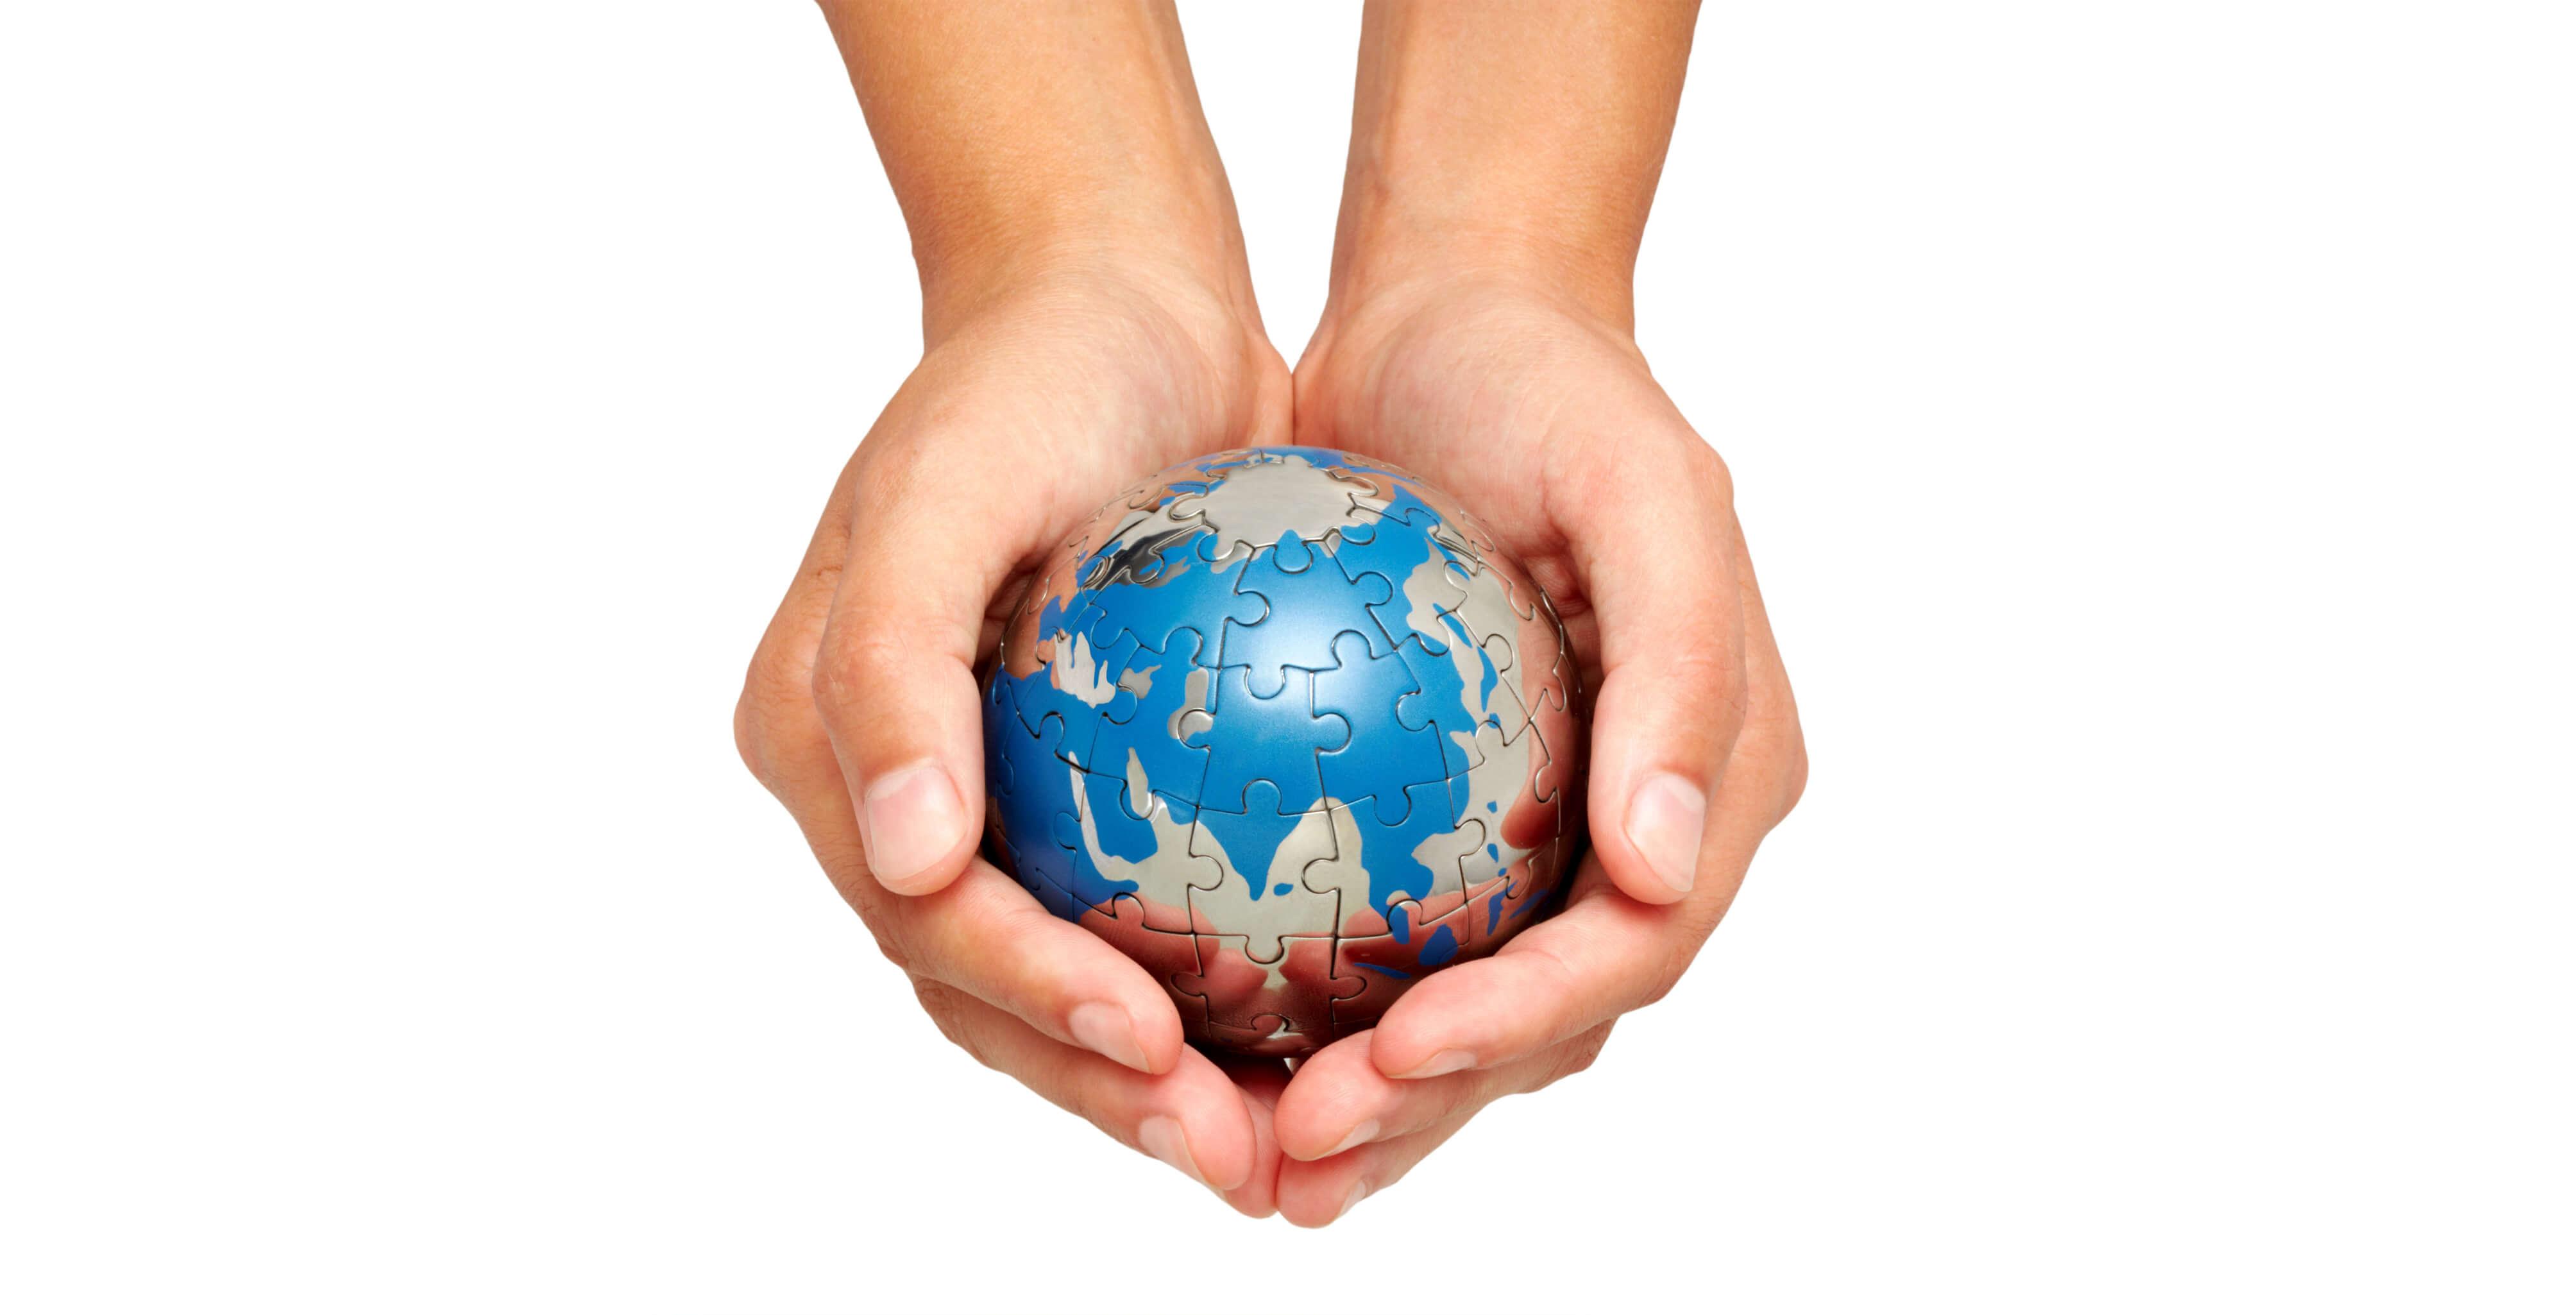 картинка шар земной в руках на прозрачном фоне даже знаю